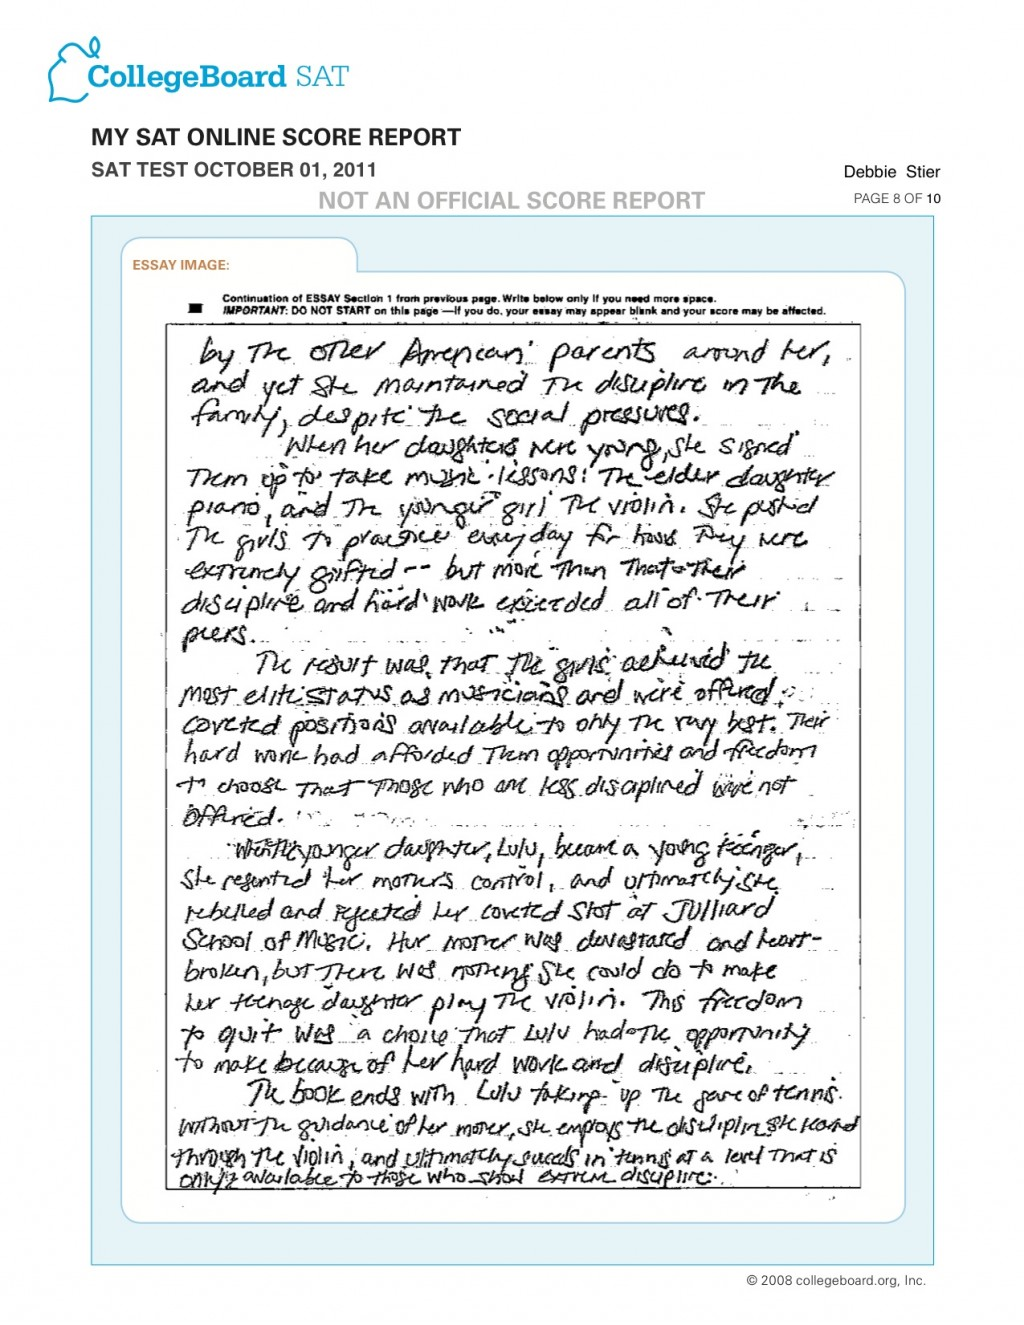 007 Sat Essay Sample Oct Page Wondrous Pdf Large